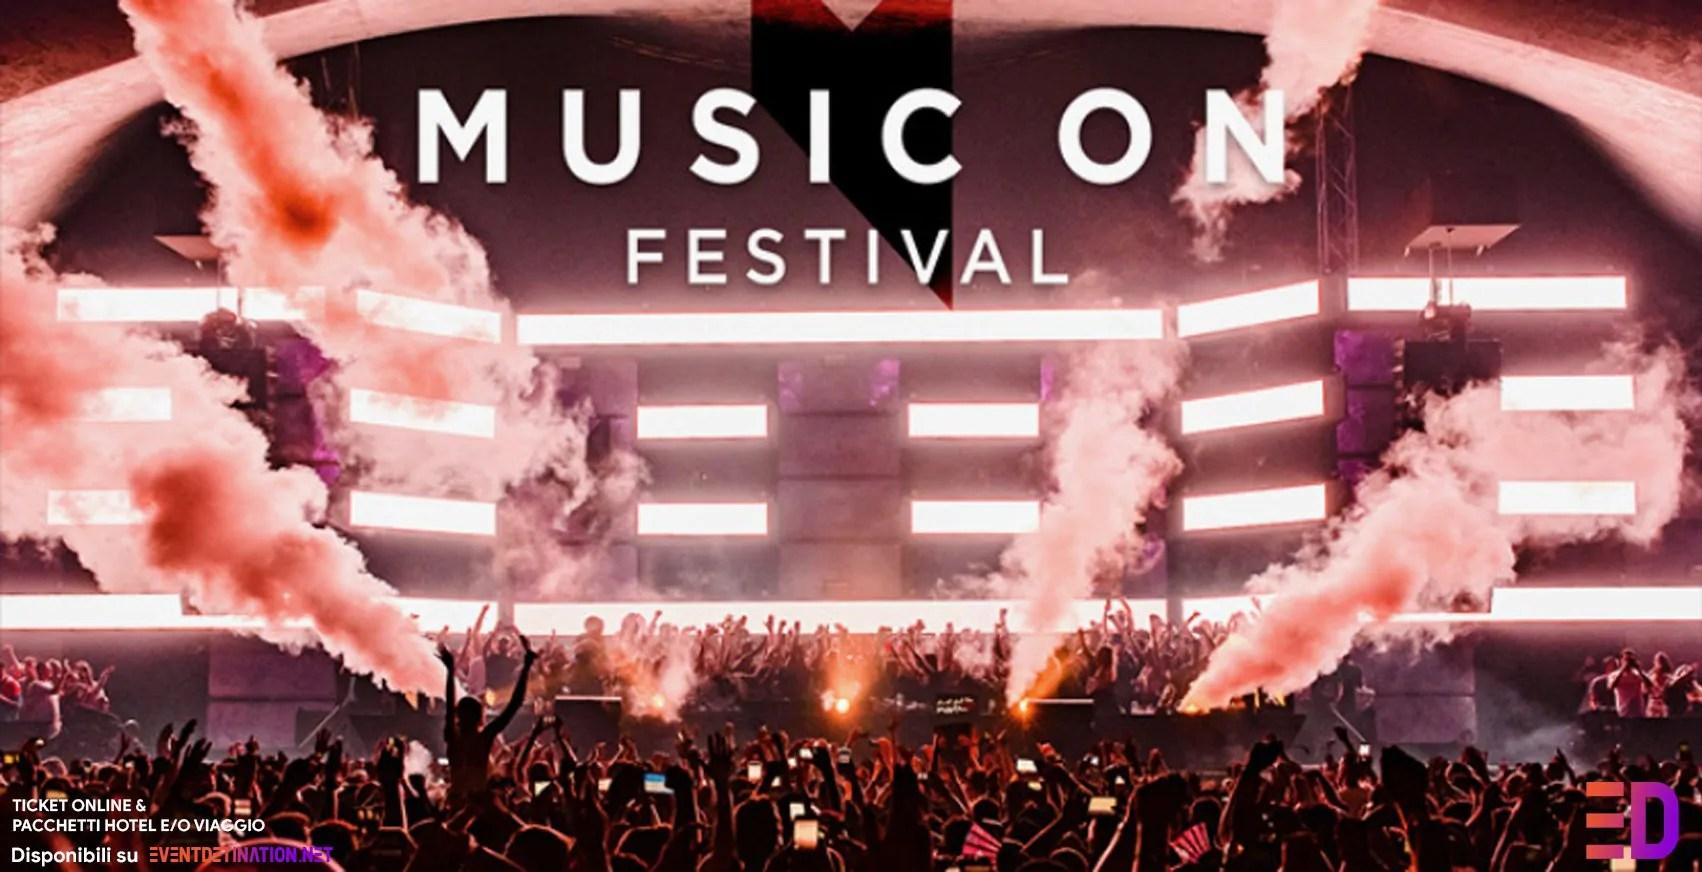 MUSIC ON Festival 2020 Amsterdam – Week End 09 e 10 Maggio 2020